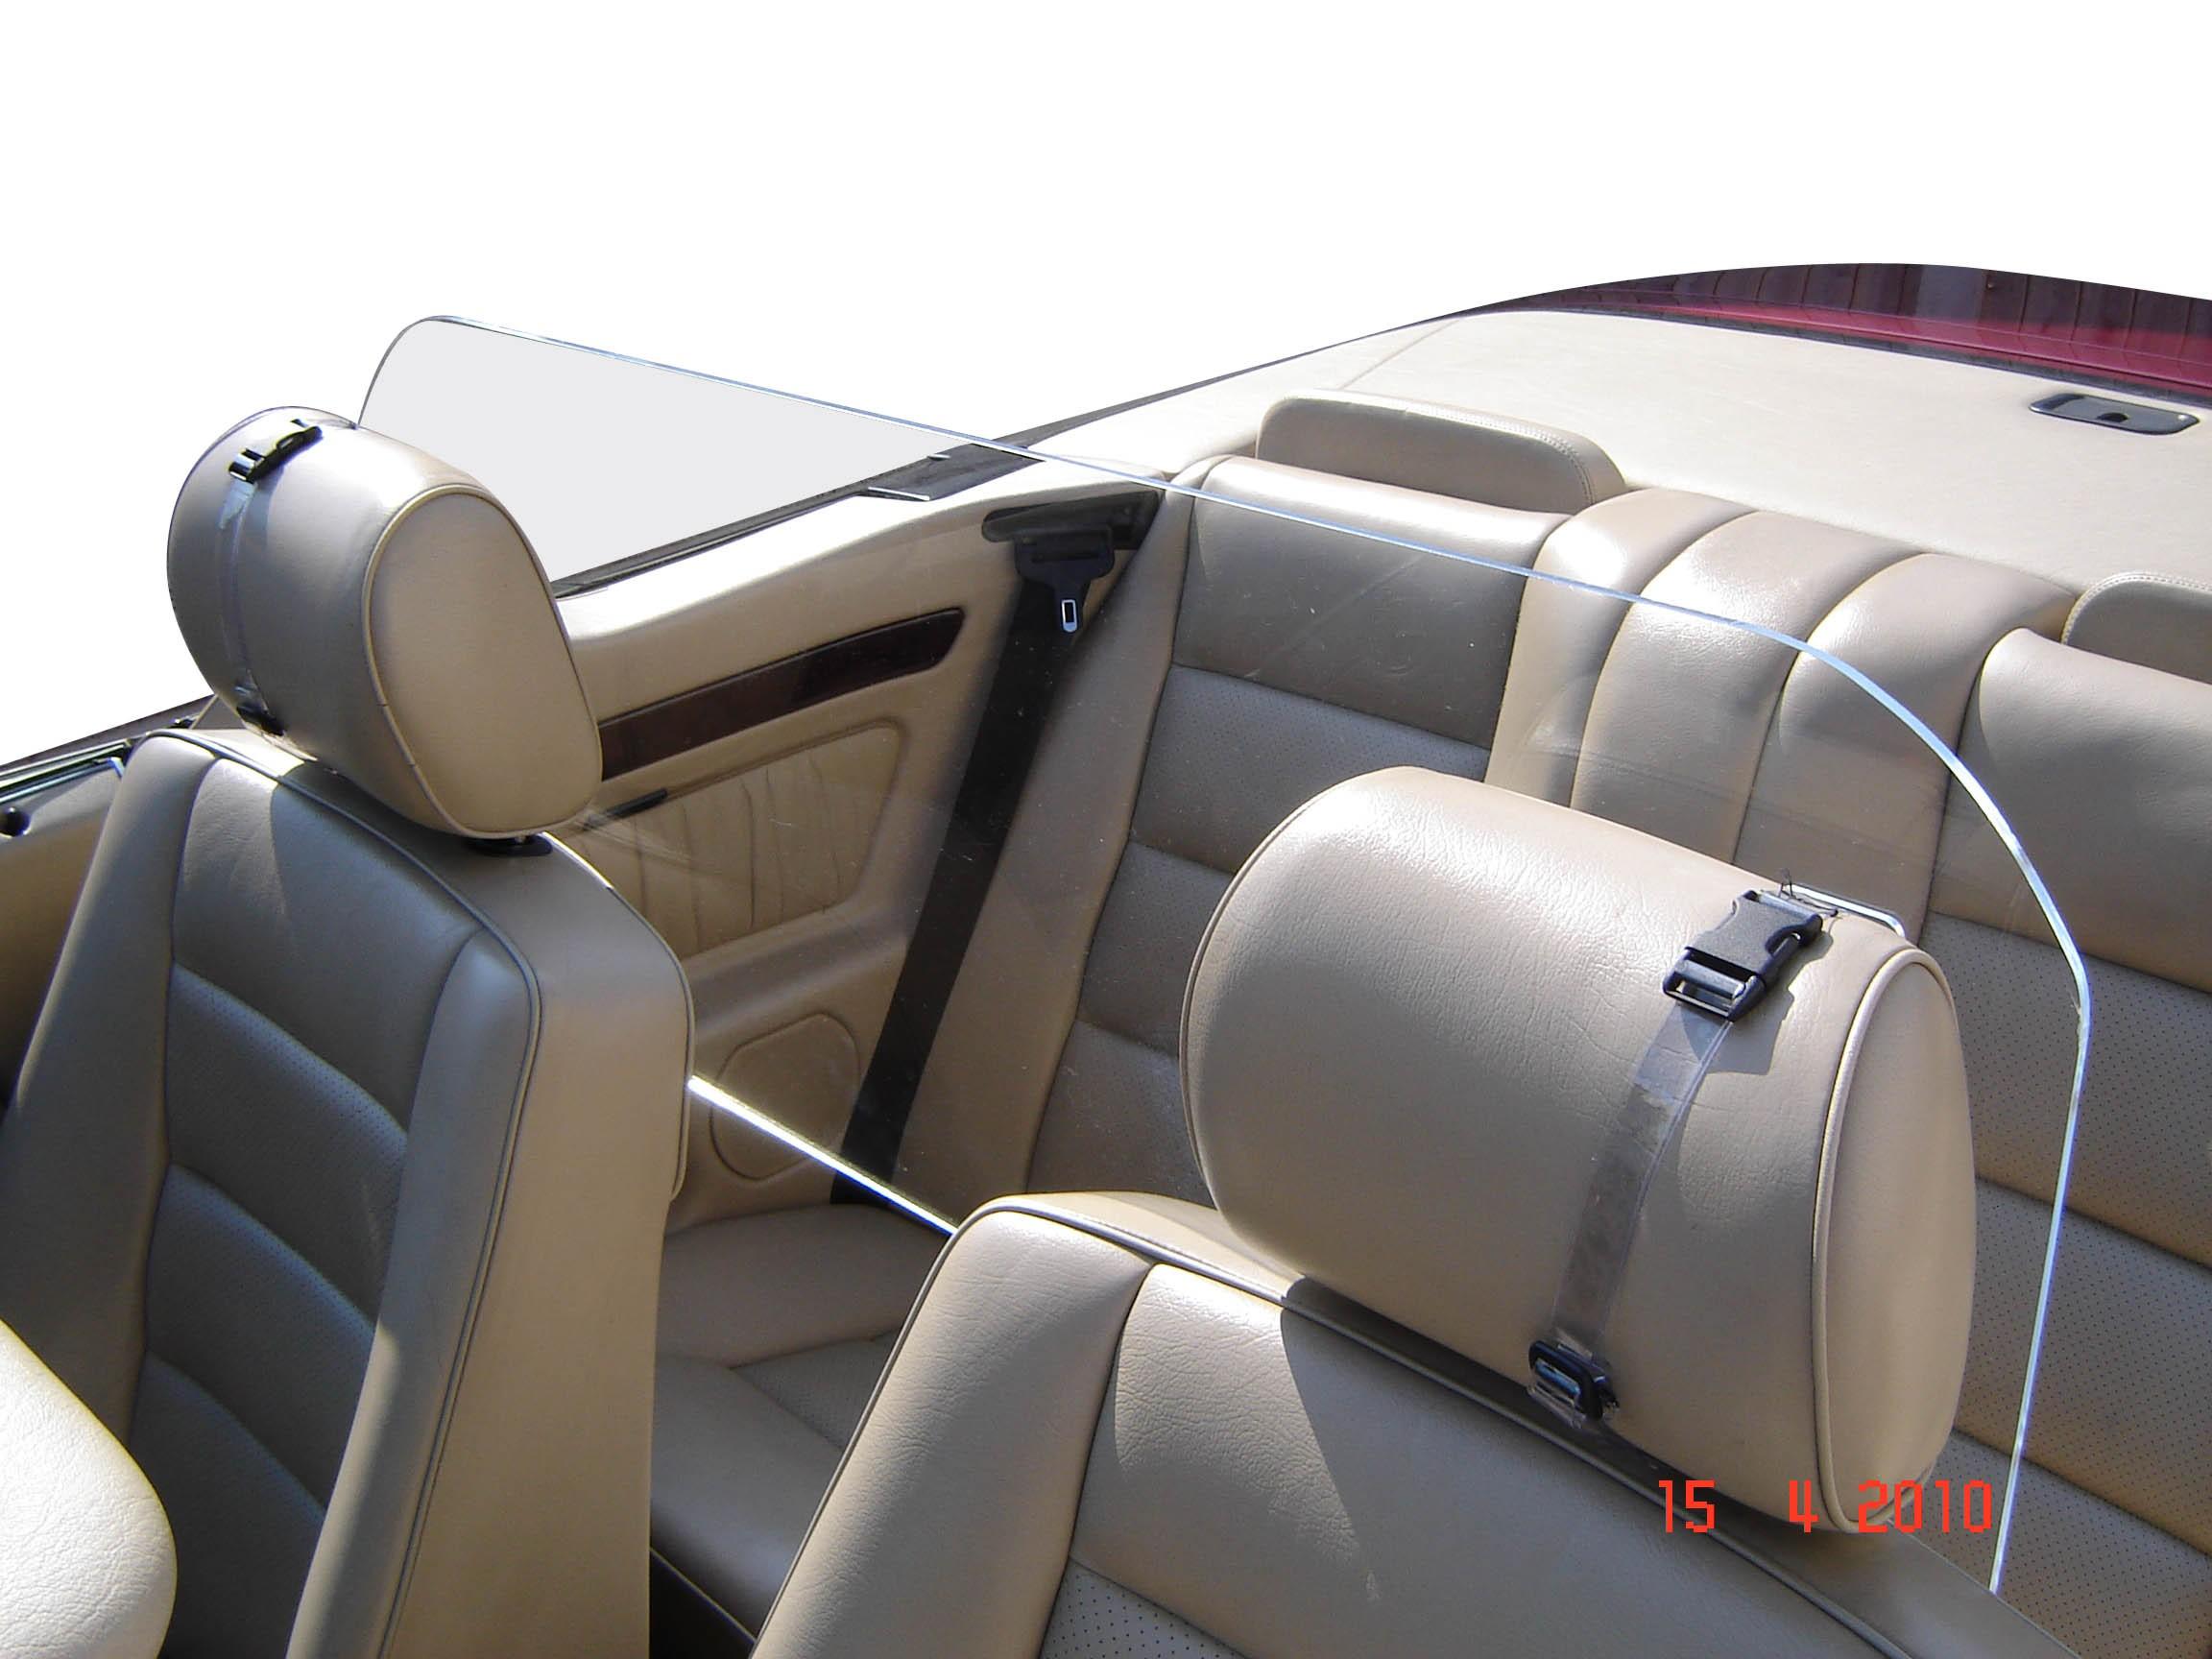 Toyota Solara Regular